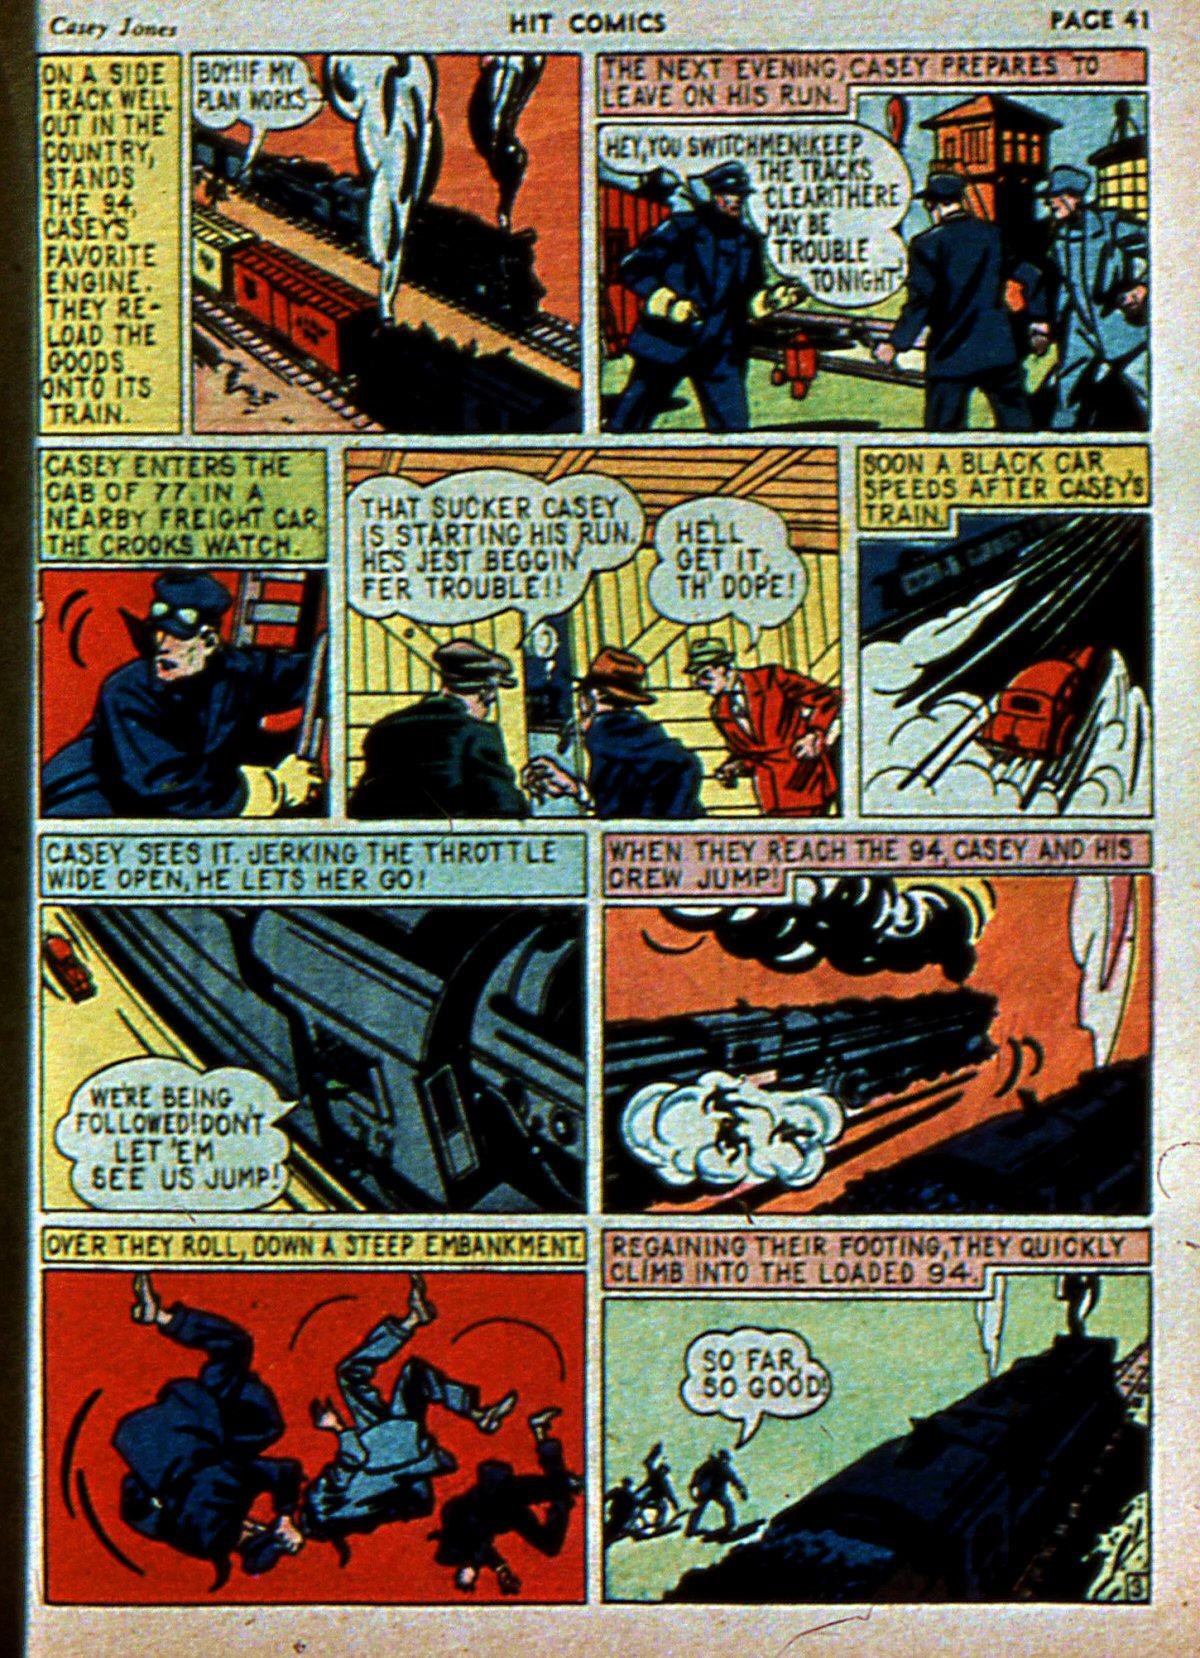 Read online Hit Comics comic -  Issue #3 - 43